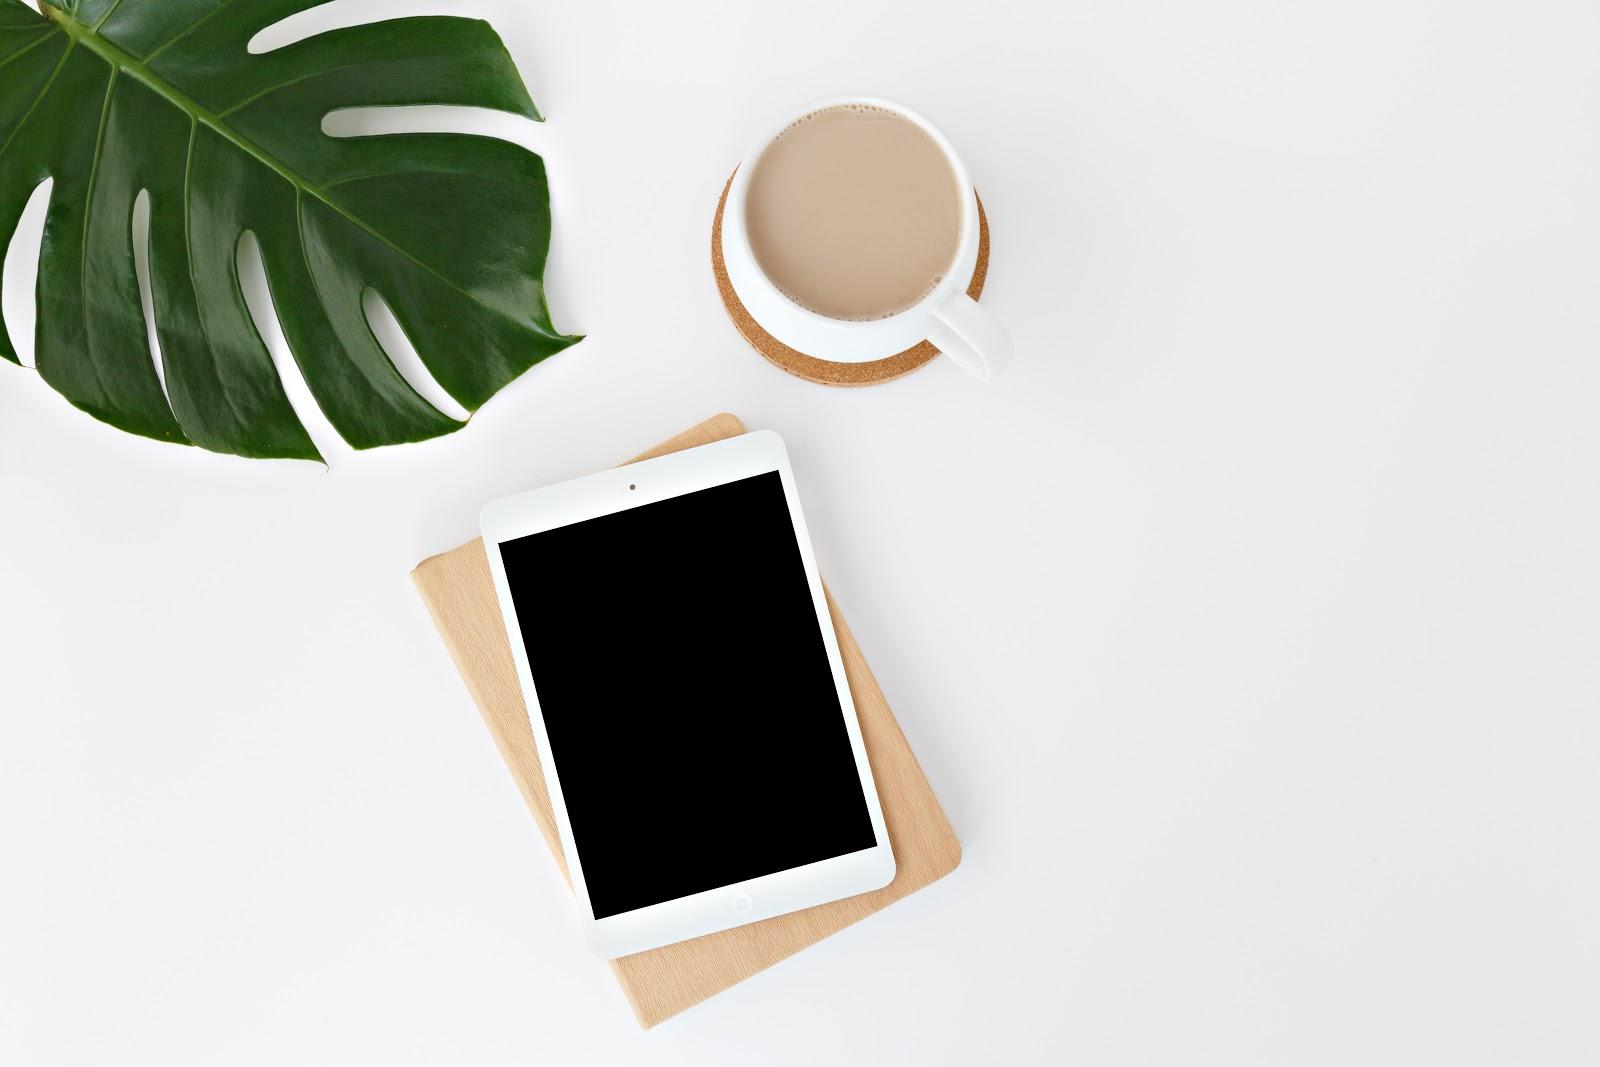 White paper or ebook?